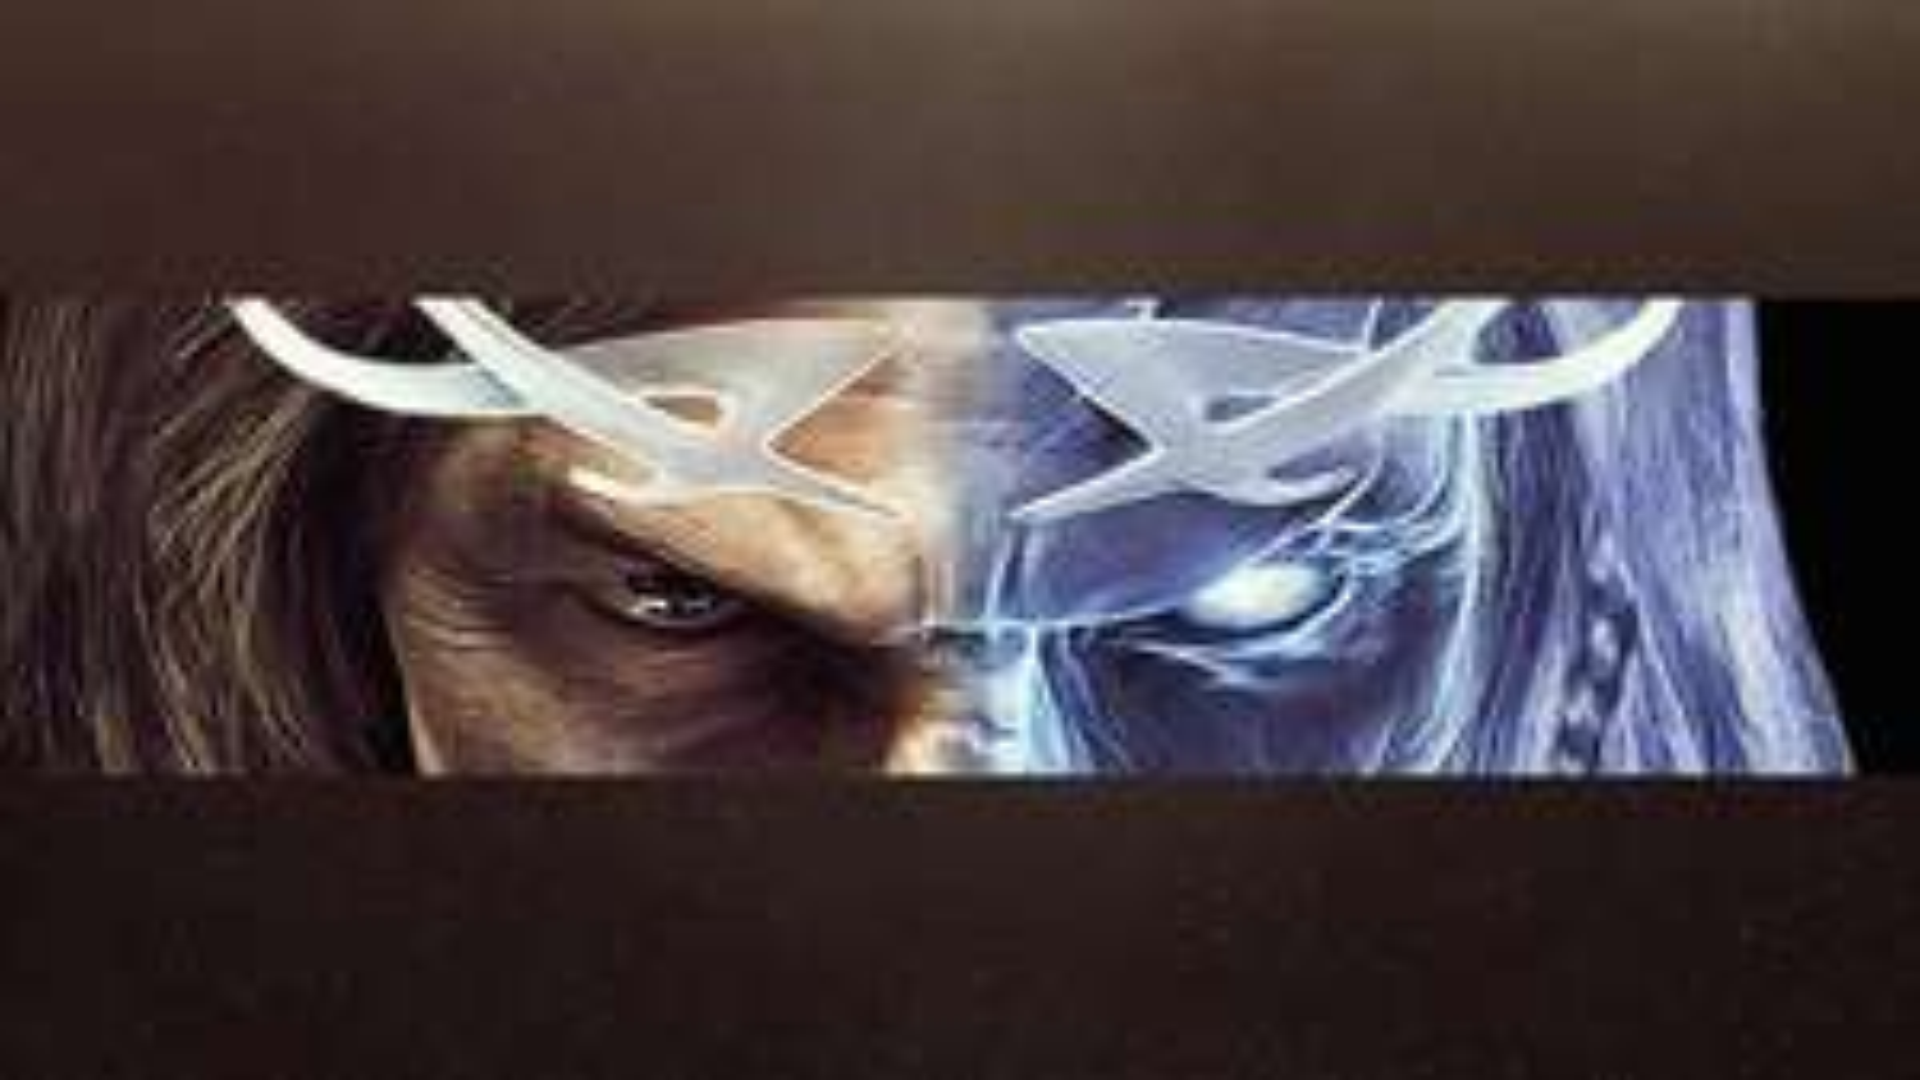 Shadow of War expansion pass £8.24 at Microsoft (Microsoft Store)